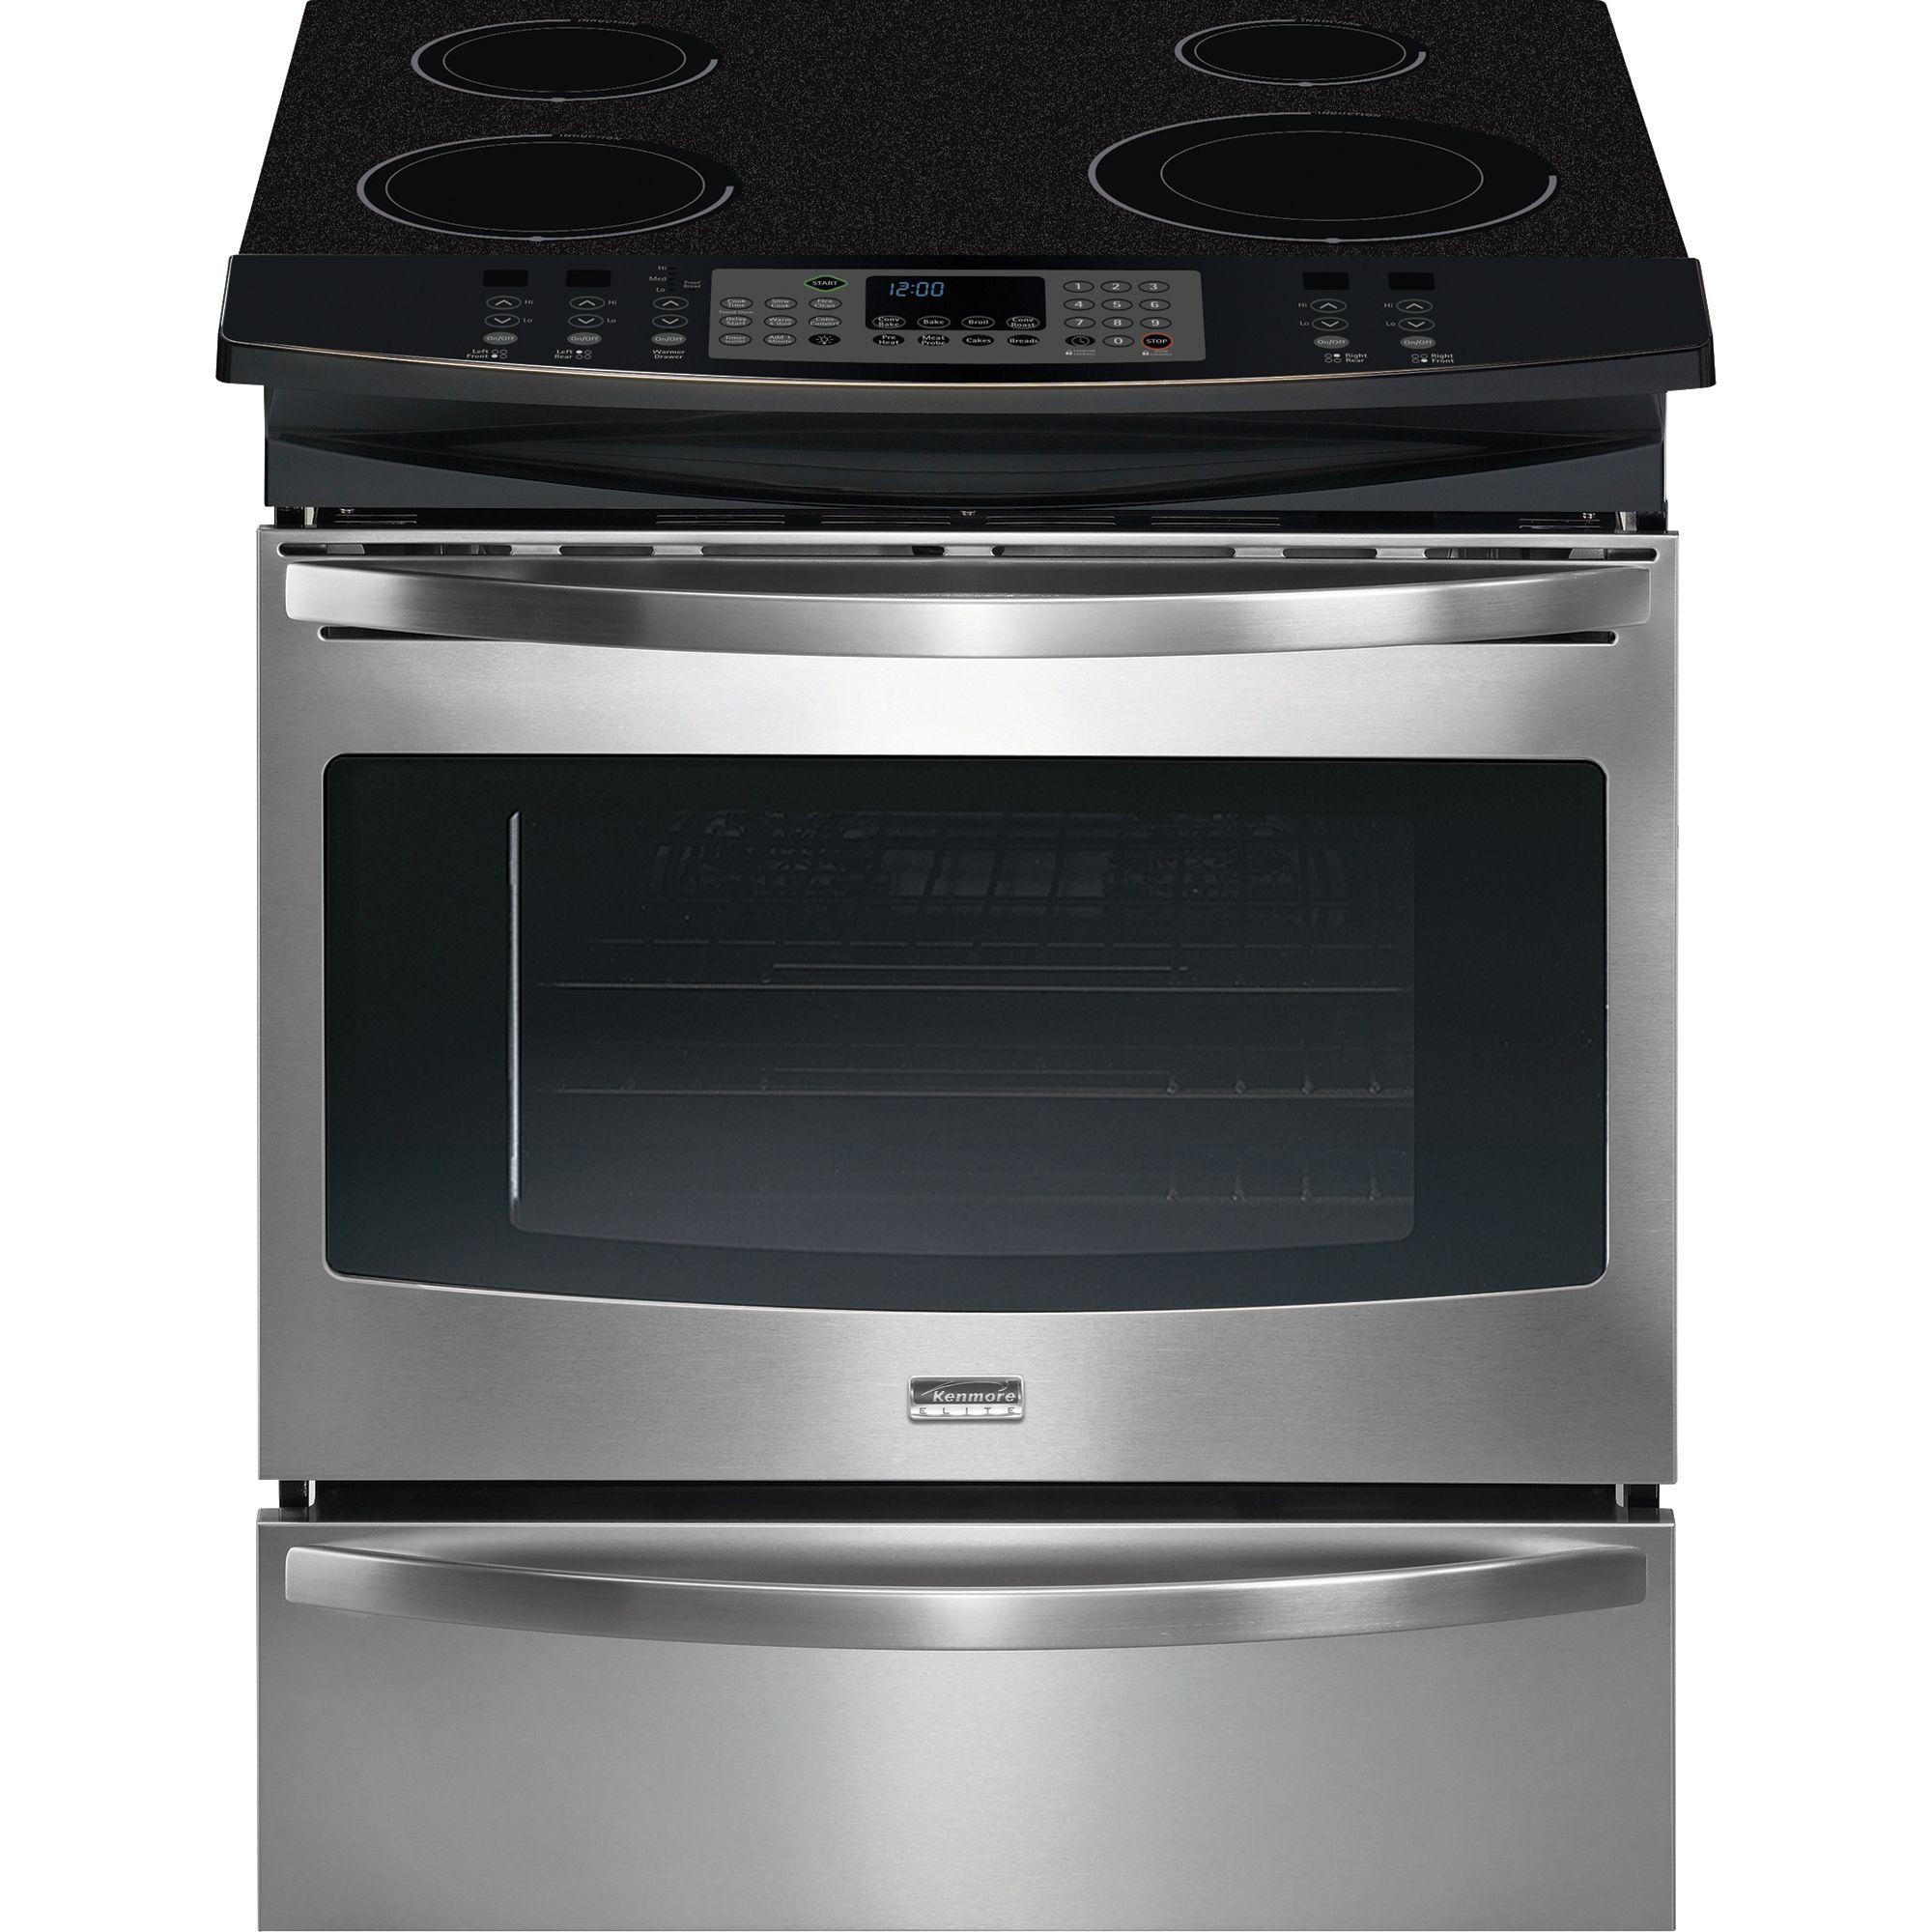 Kitchenaid Dishwasher Wiring Harness Diagram